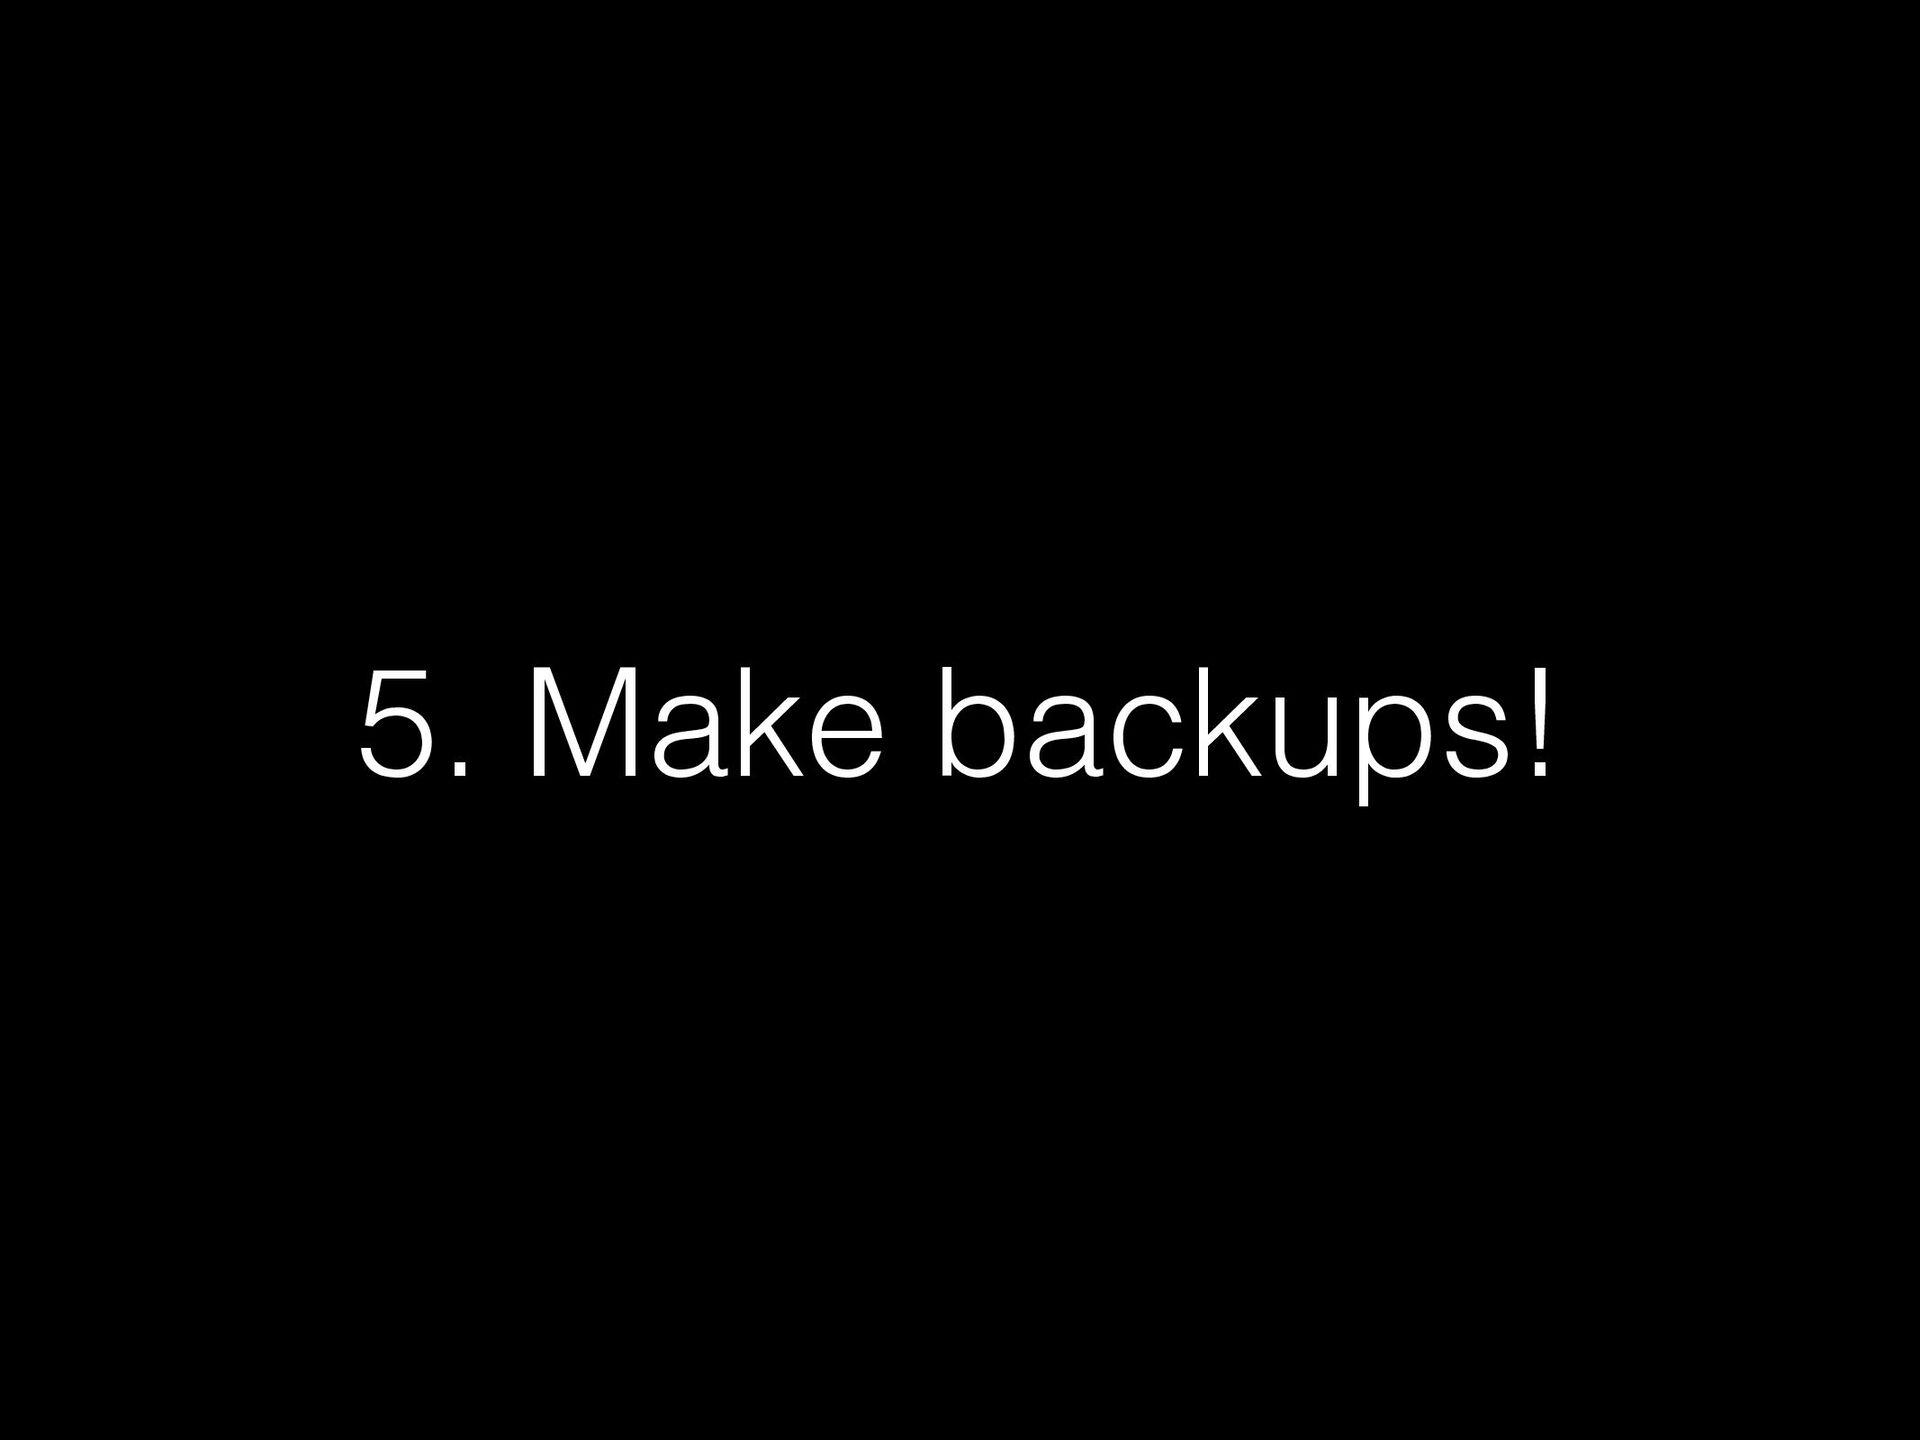 5. Make backups!